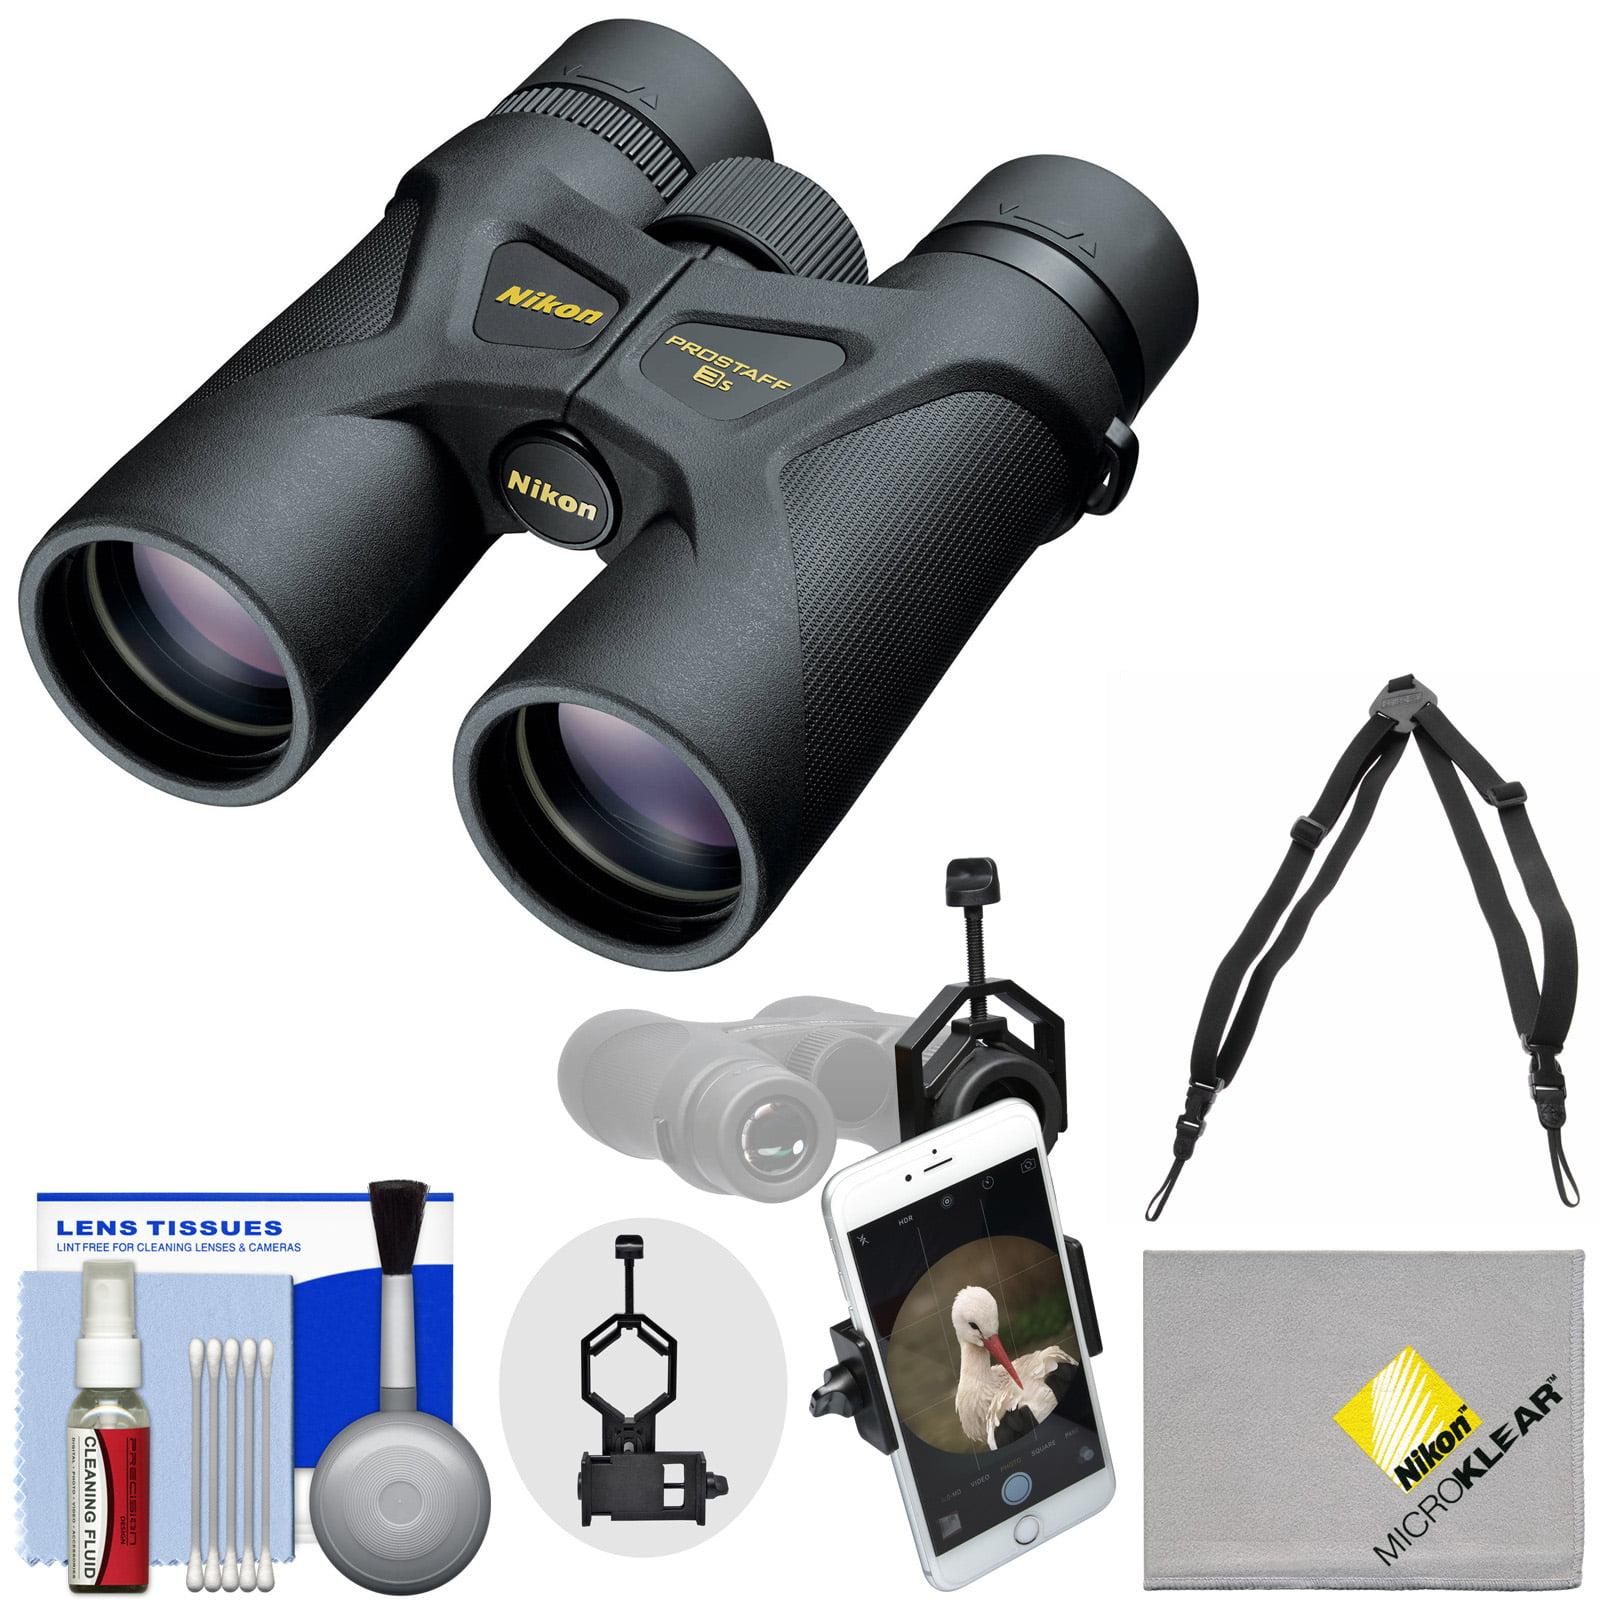 Nikon Prostaff 3S 10x42 Waterproof / Fogproof Binoculars ...